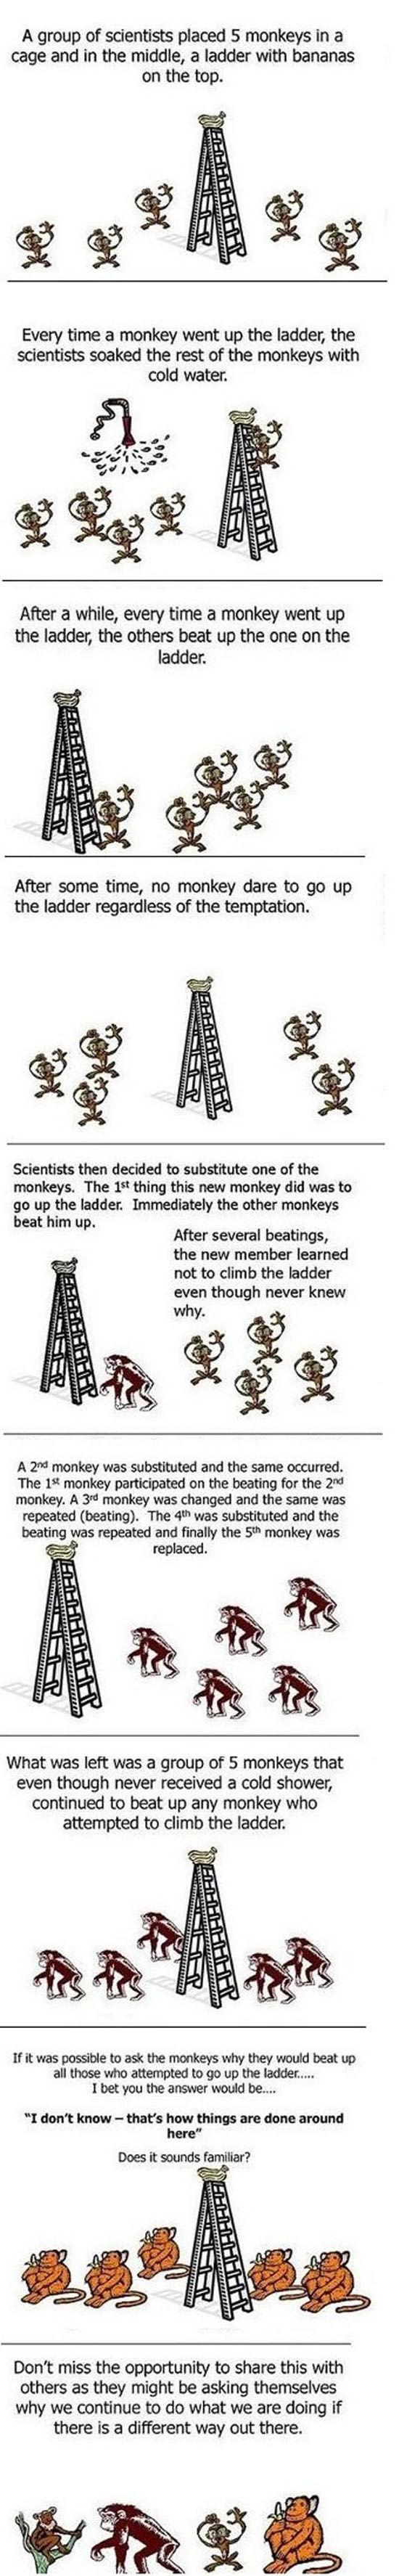 Curious Monkey Experiment